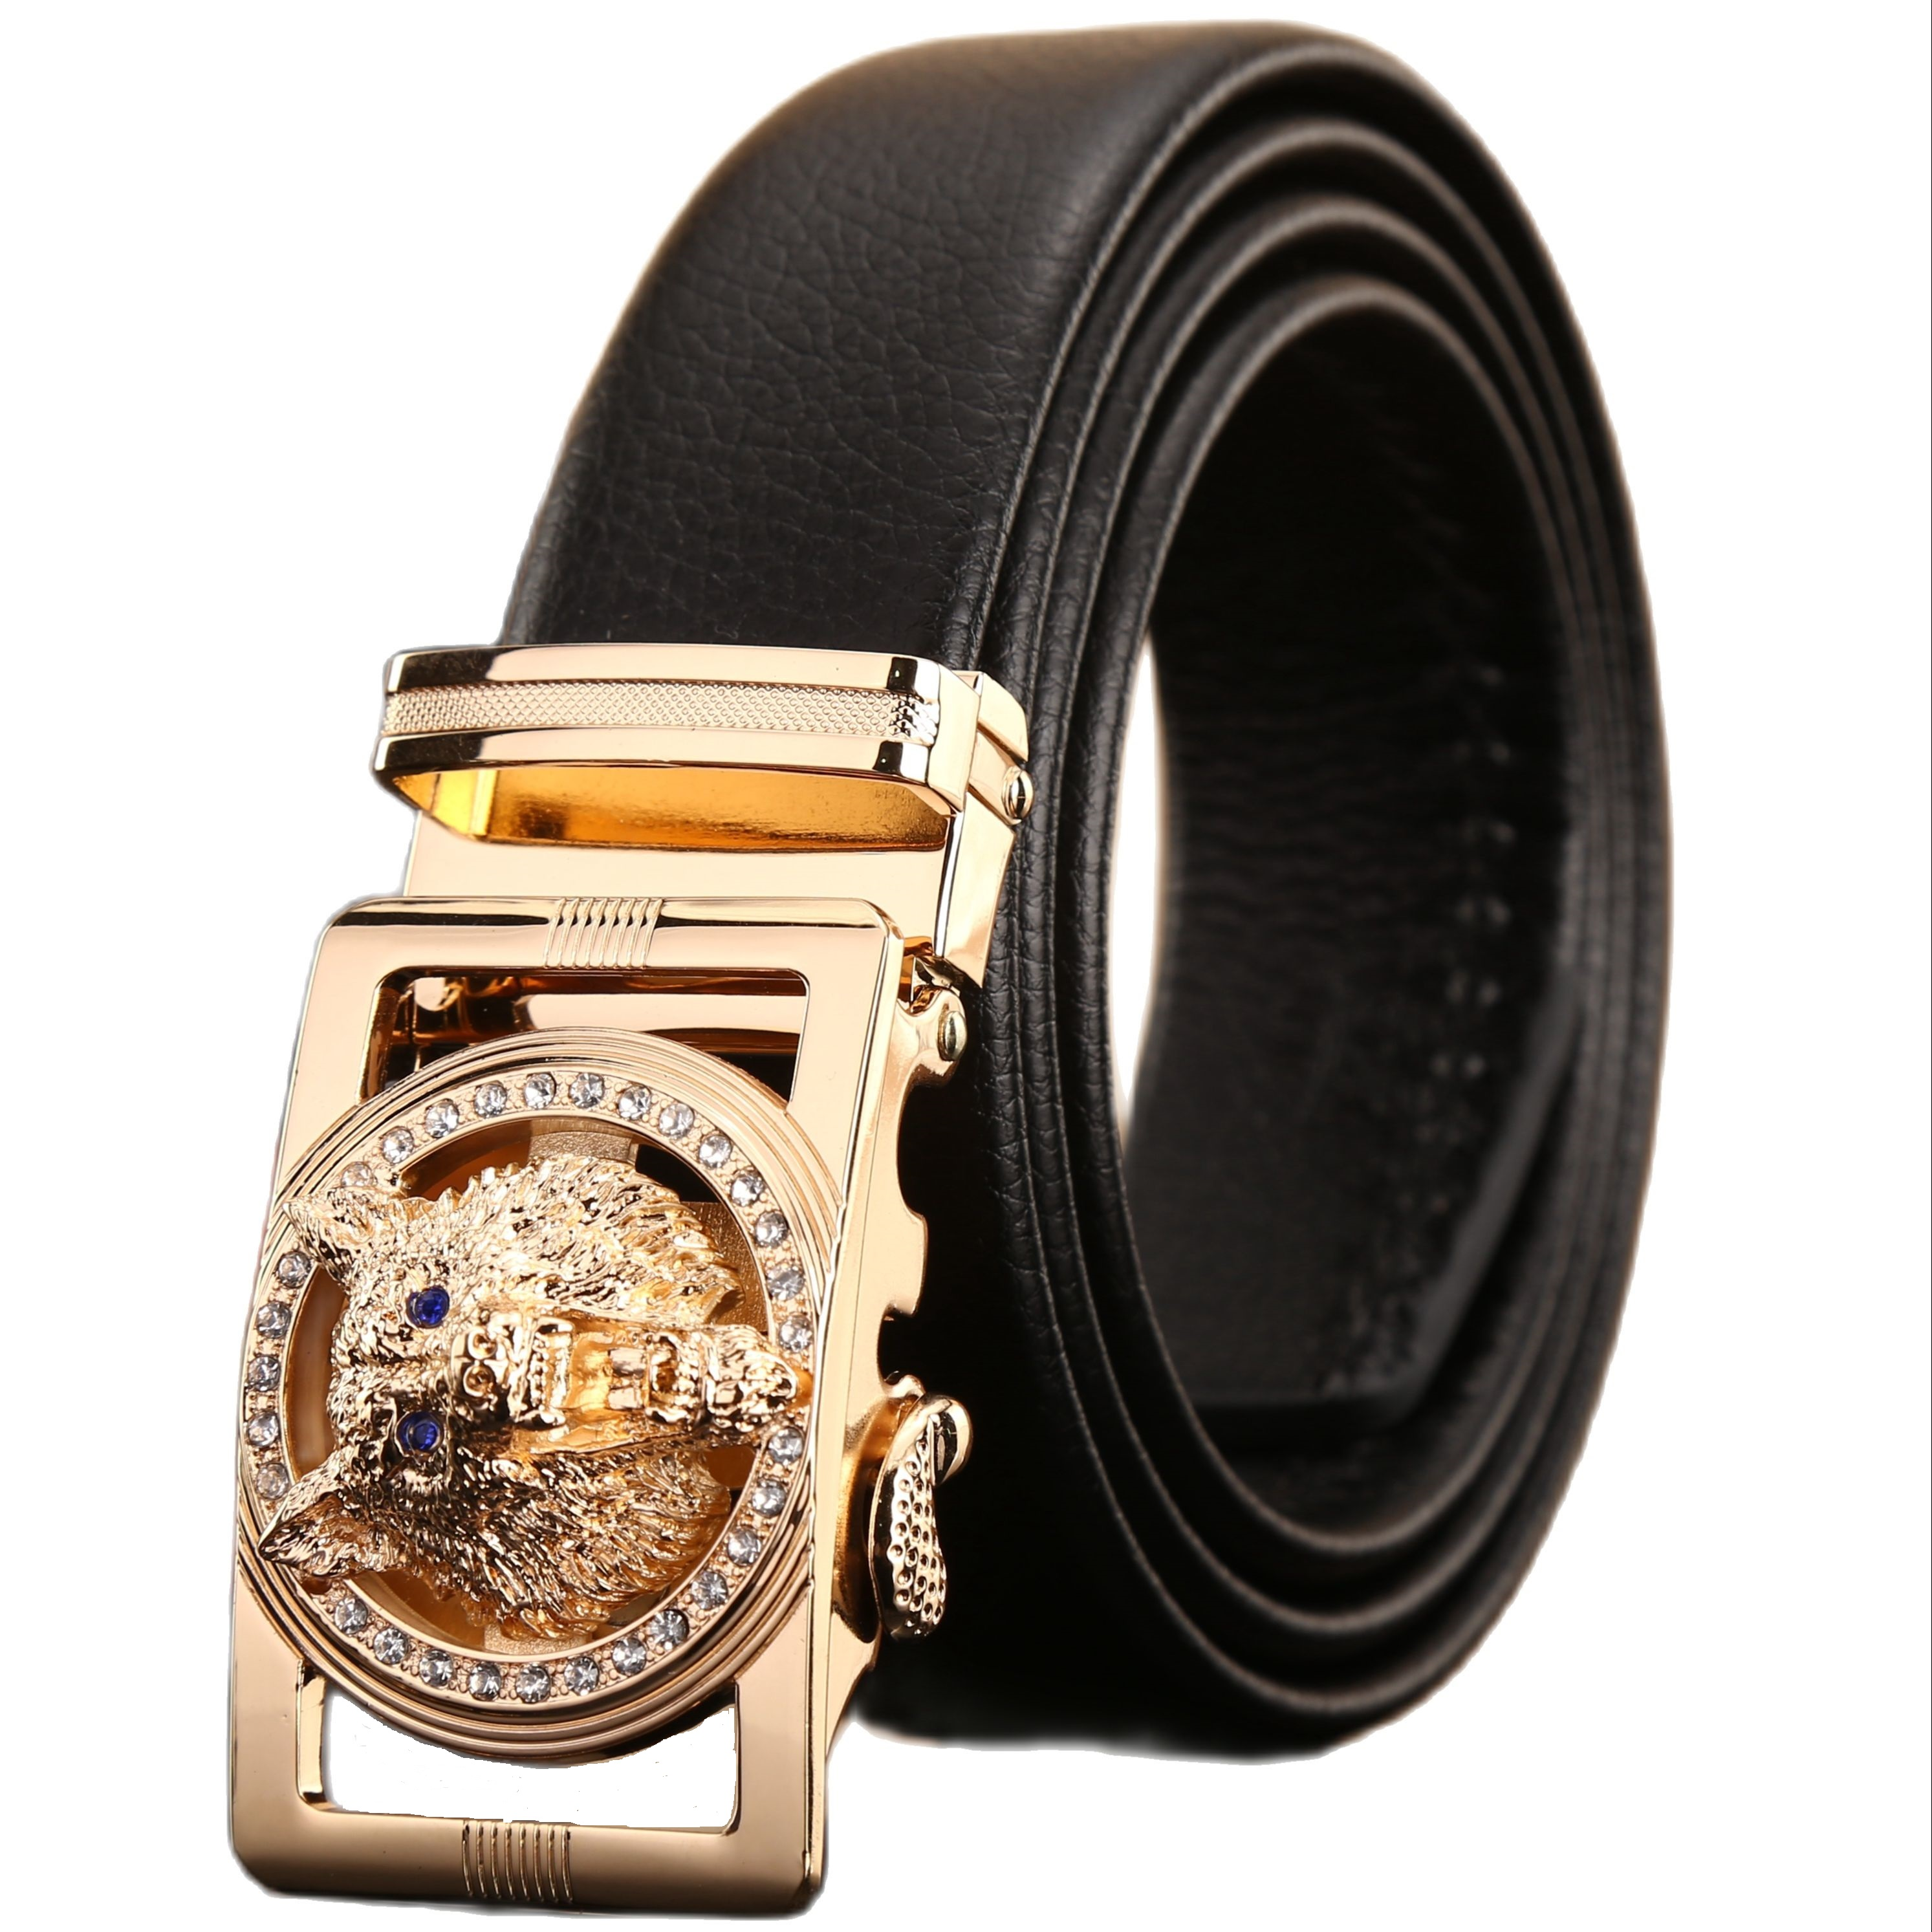 2022 new designer belts men high quality luxury fiber leather big size 140 cm 150 160 automatic buckle wolf 170 180 plus brown